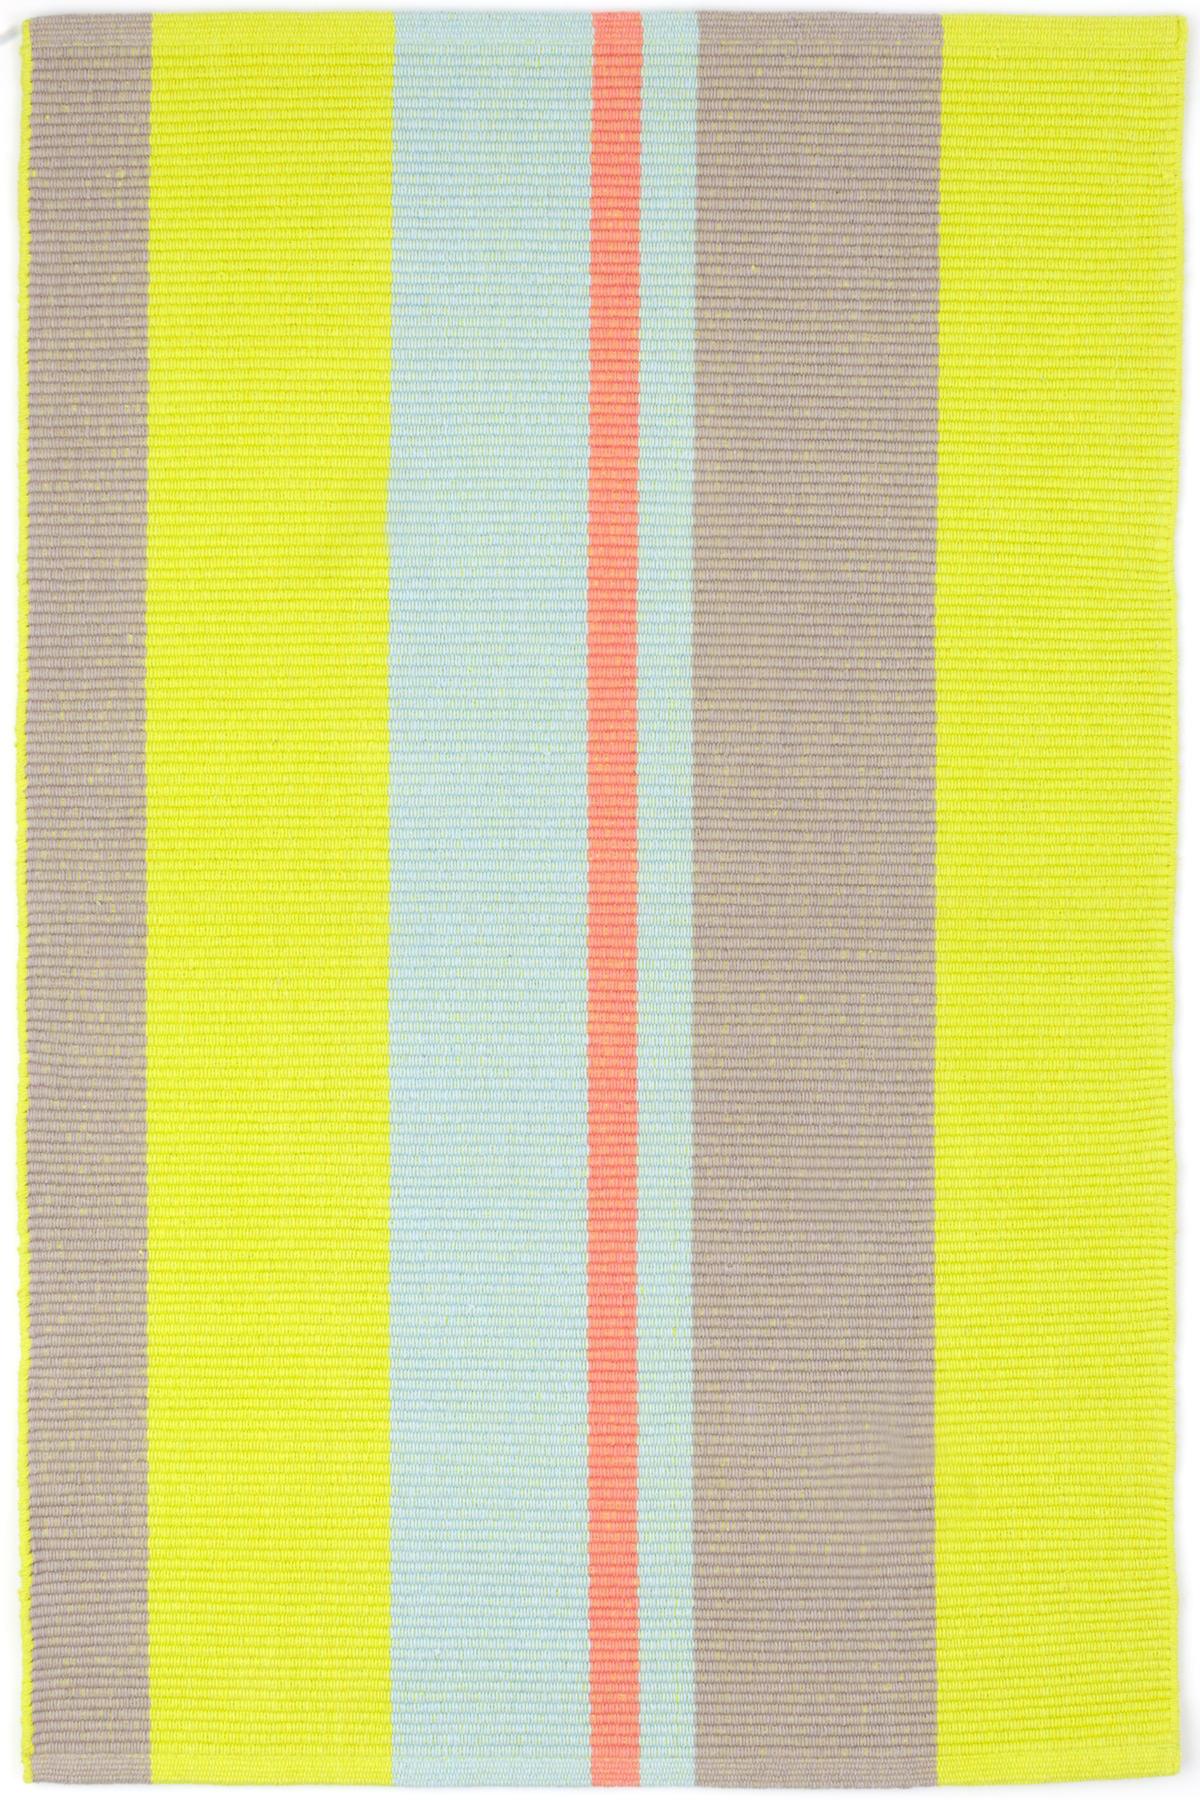 Antibes Stripe Woven Cotton Rug